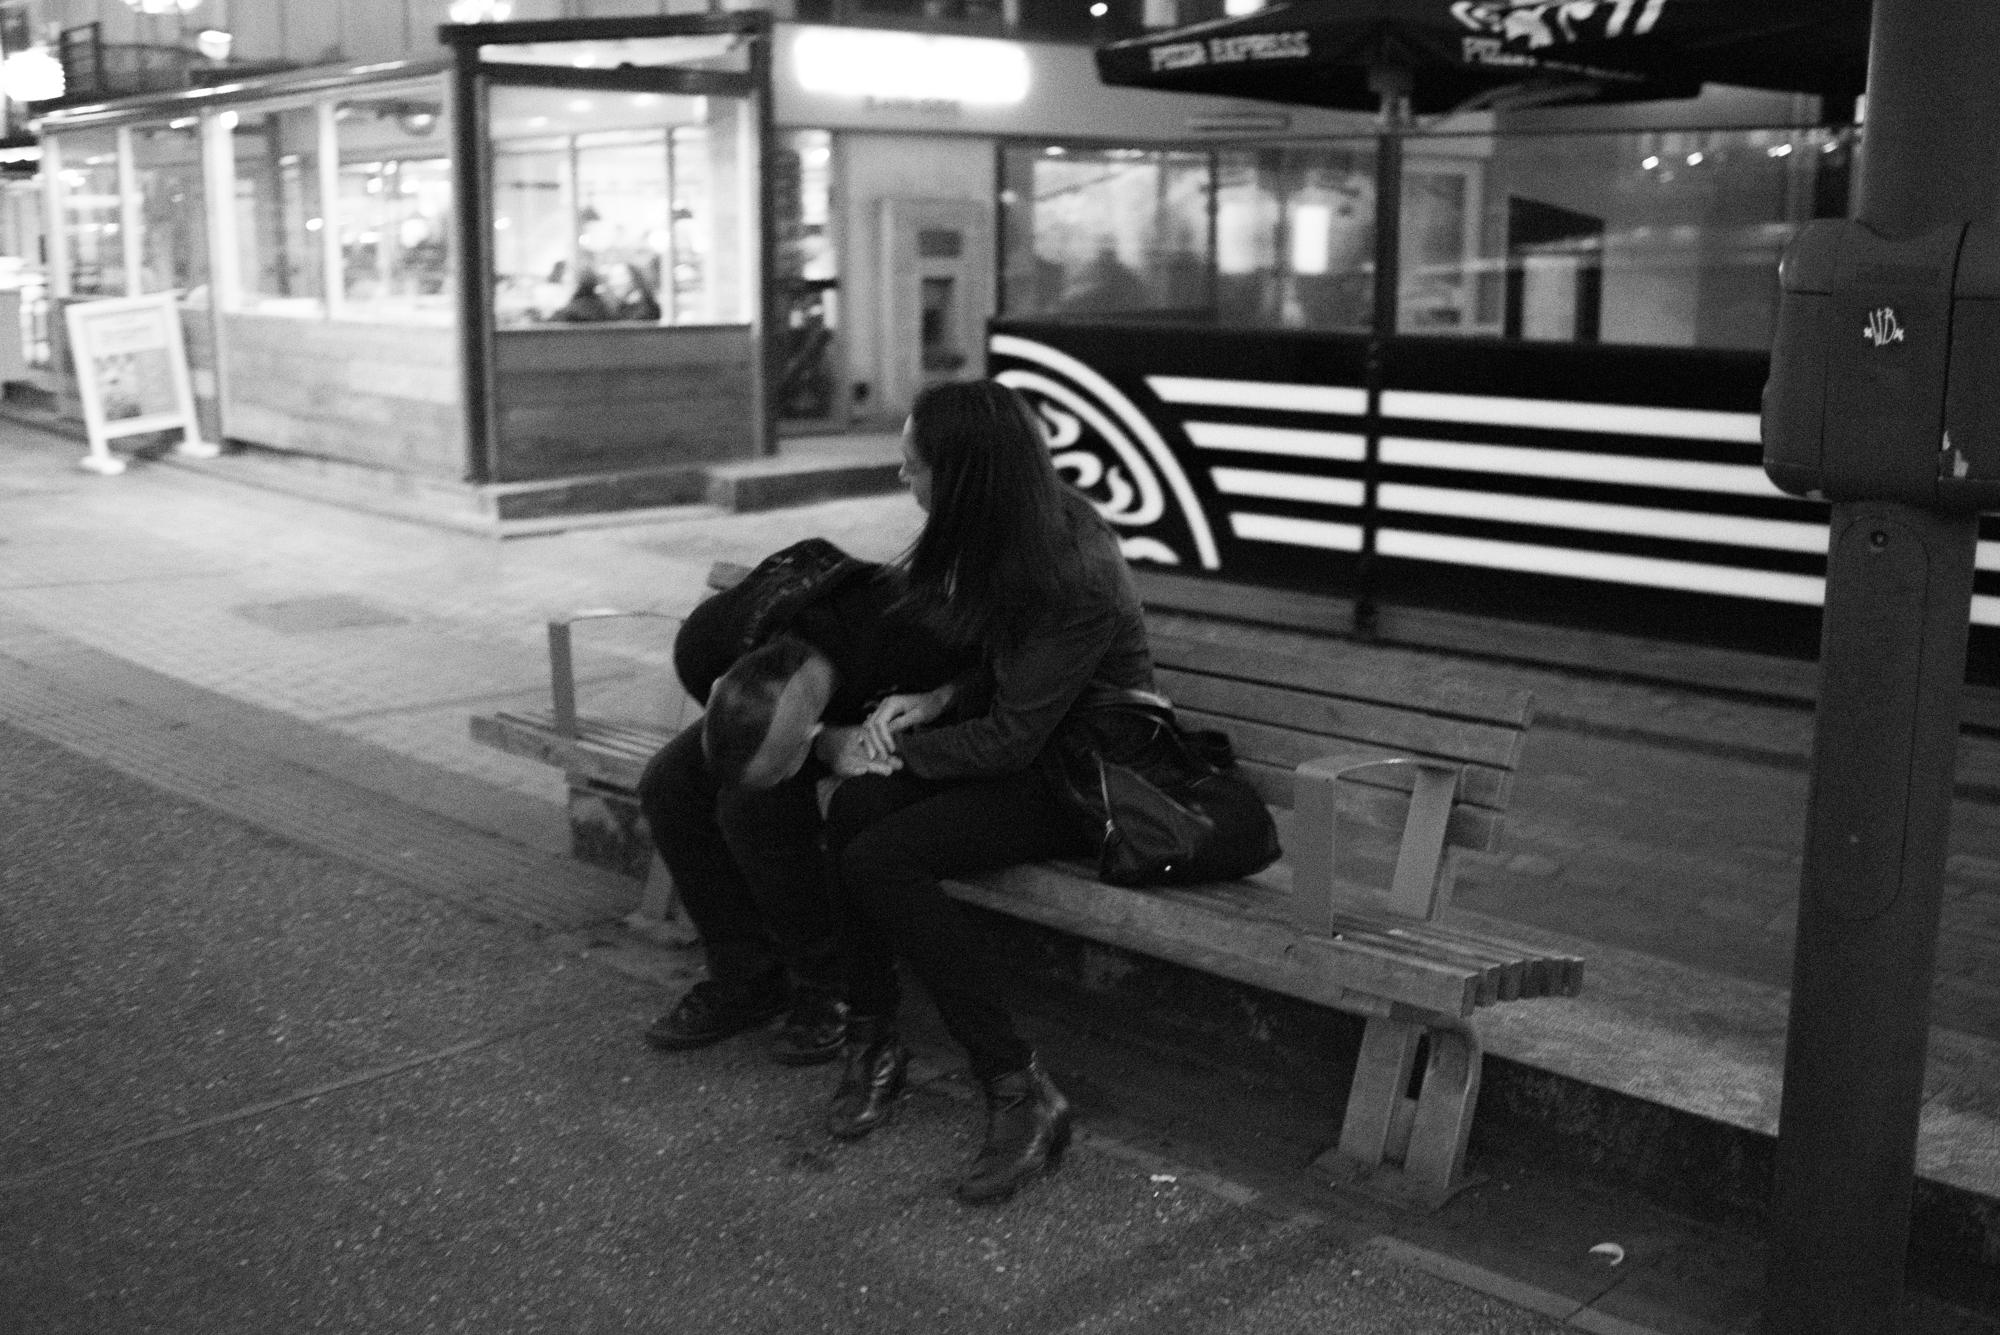 London street photography southbank